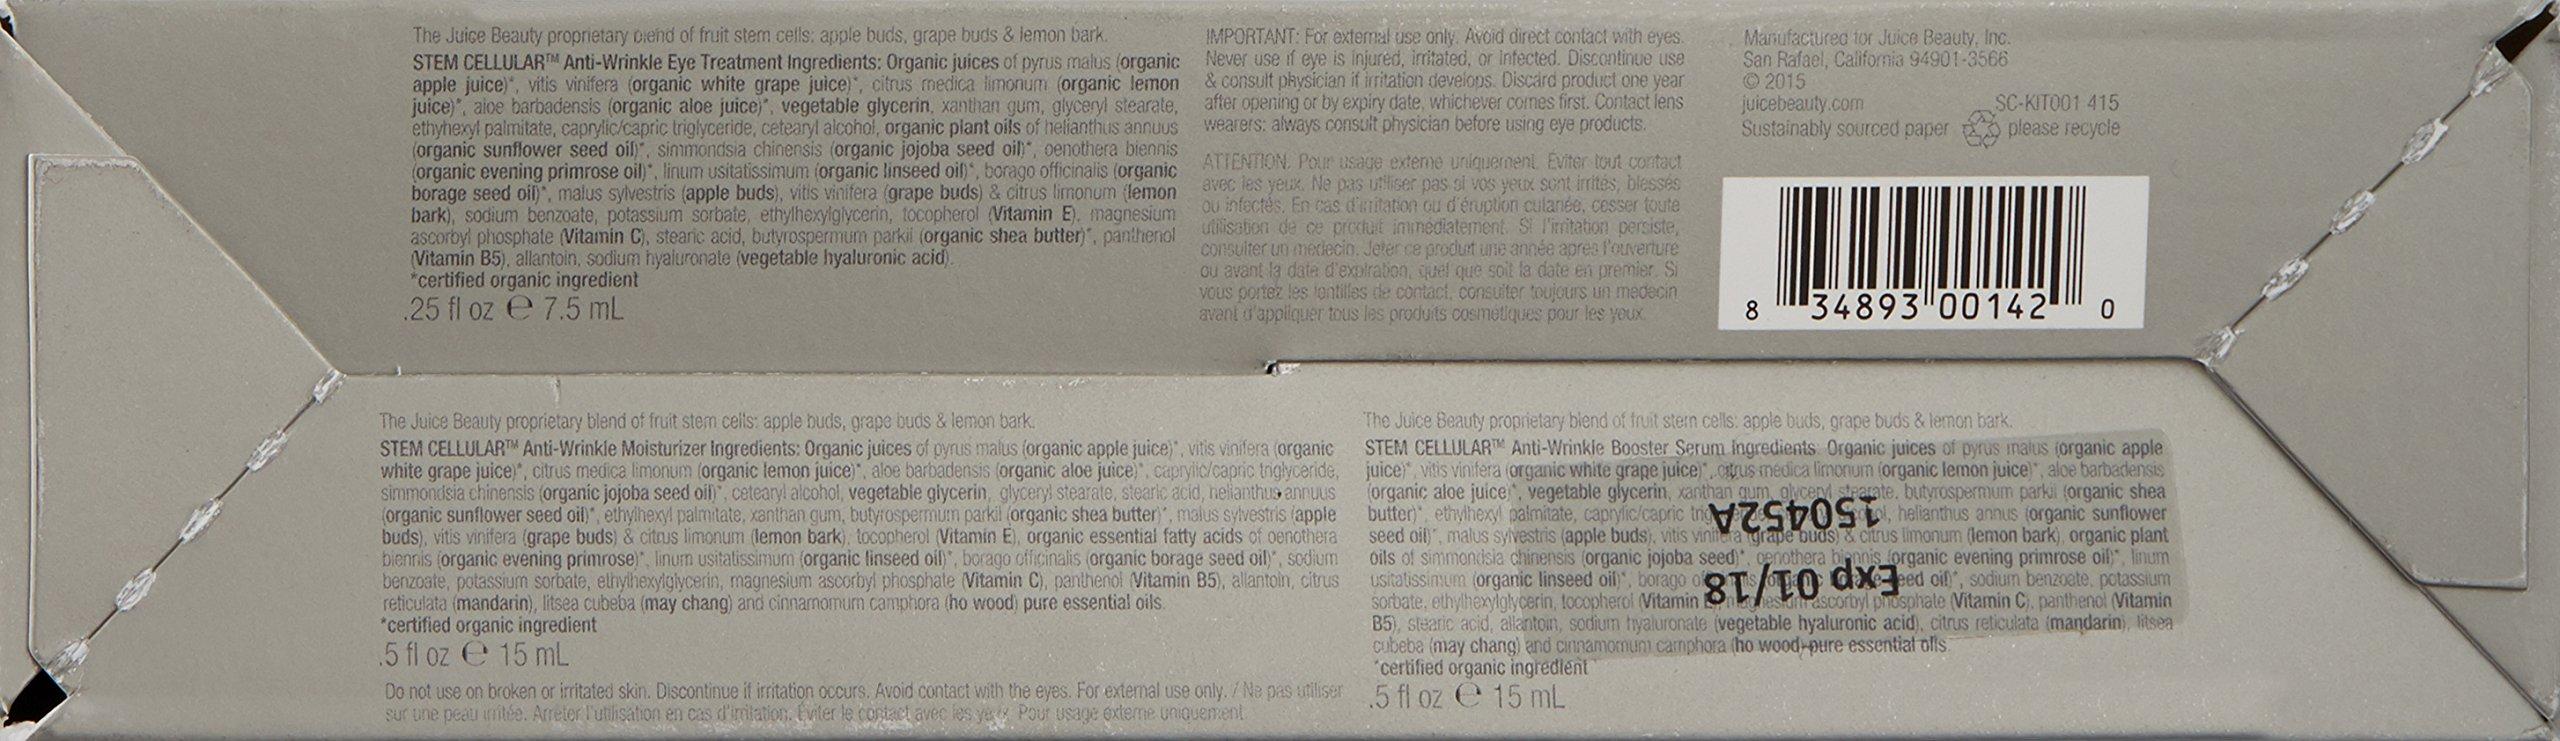 Juice Beauty Stem Cellular Anti-Wrinkle Solutions Kit by Juice Beauty (Image #3)